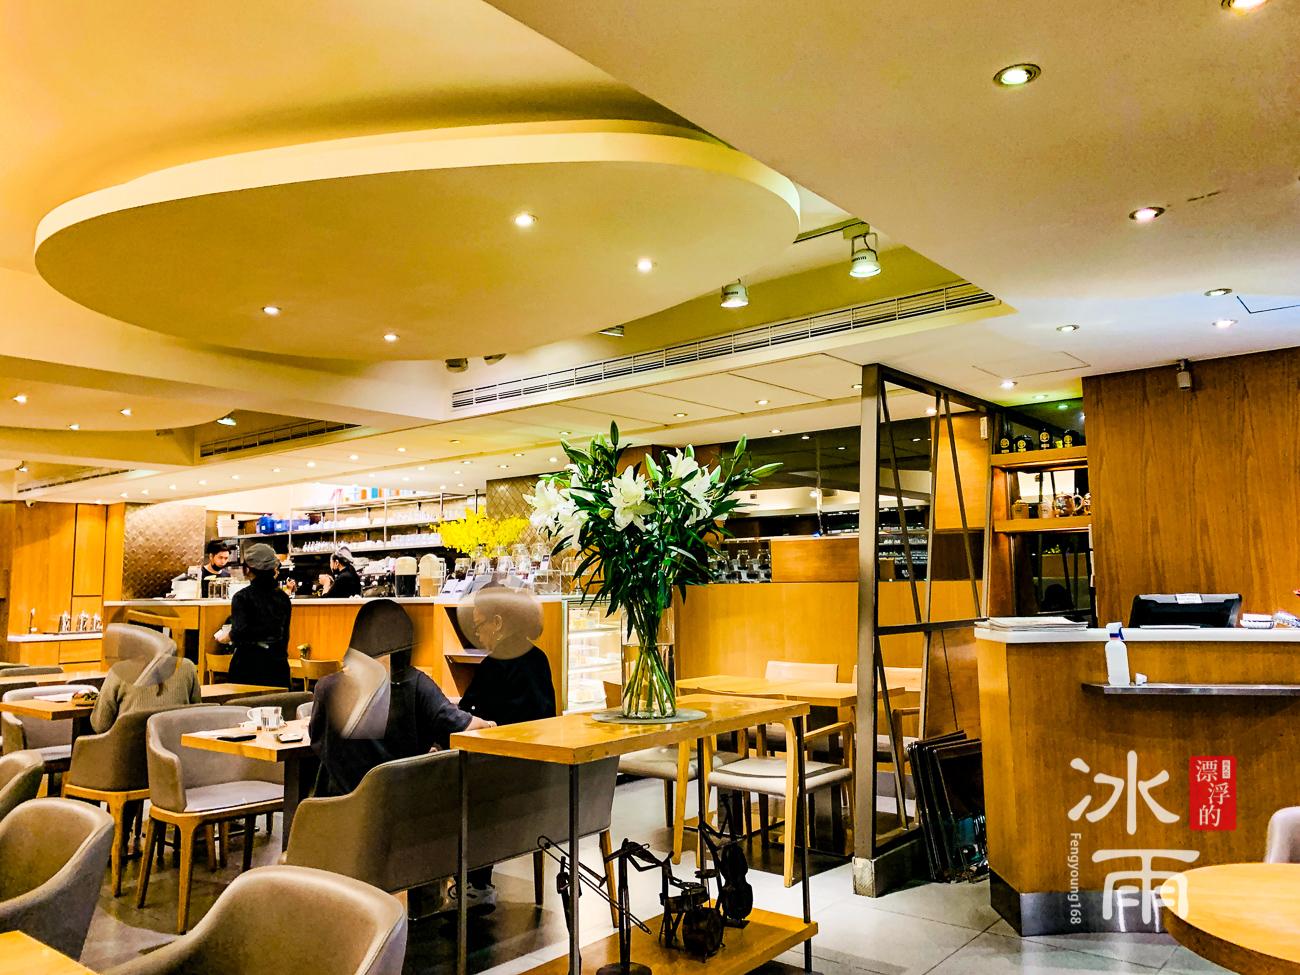 佐曼咖啡Jumane Cafe|屏風